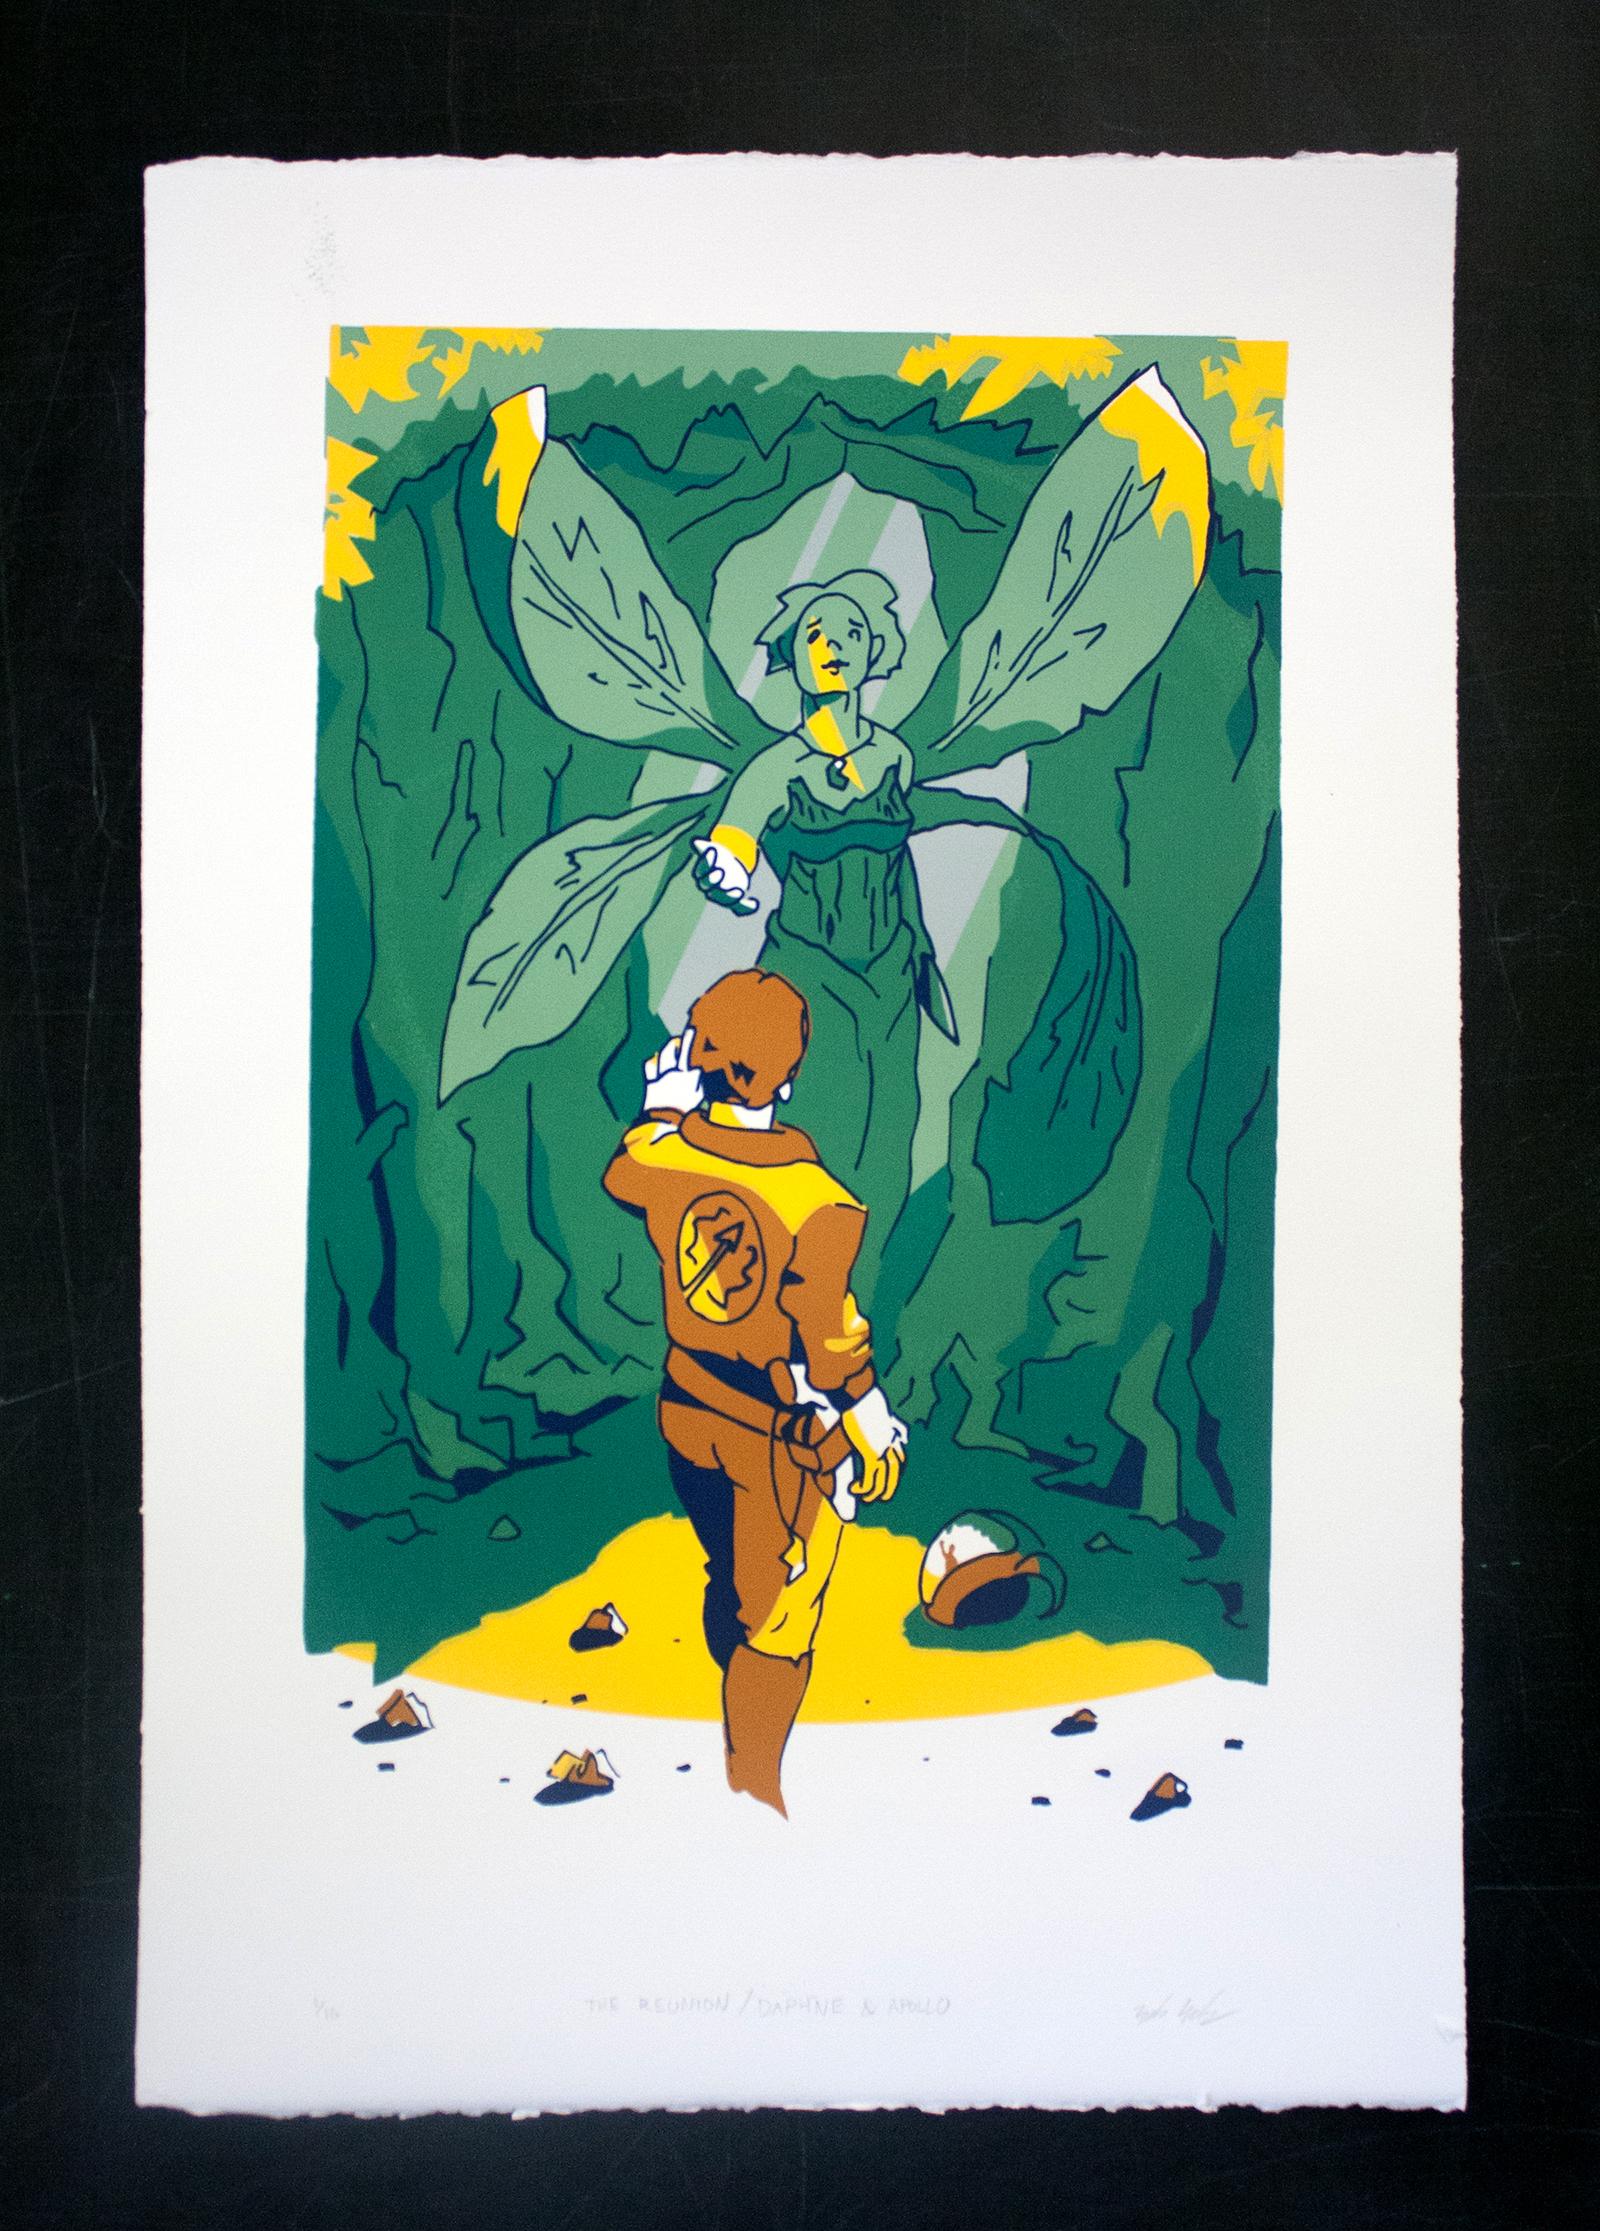 The Reunion / Daphne & Apollo, Screenprint